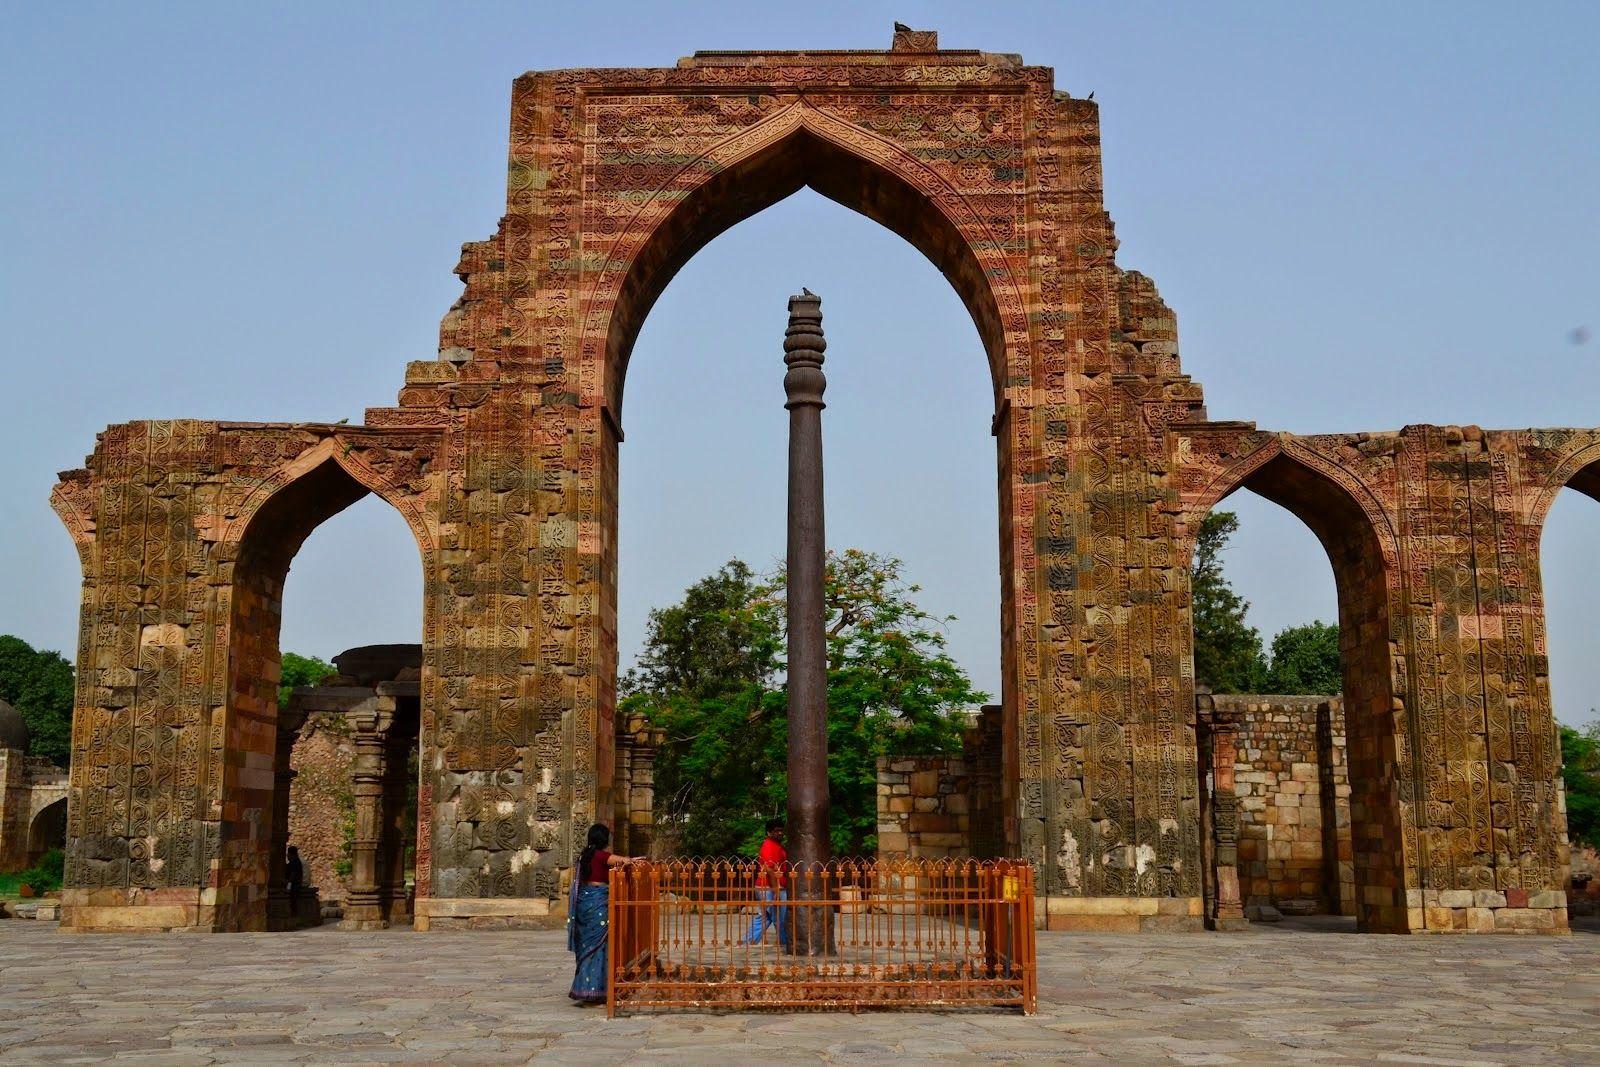 Mystery of 1600 years old Iron Pillar of Delhi ~ Mysteries of india Mar 19,  2011 - The Iron Pillar dates back even furth… | Iron pillar of delhi, New  delhi, Pillars